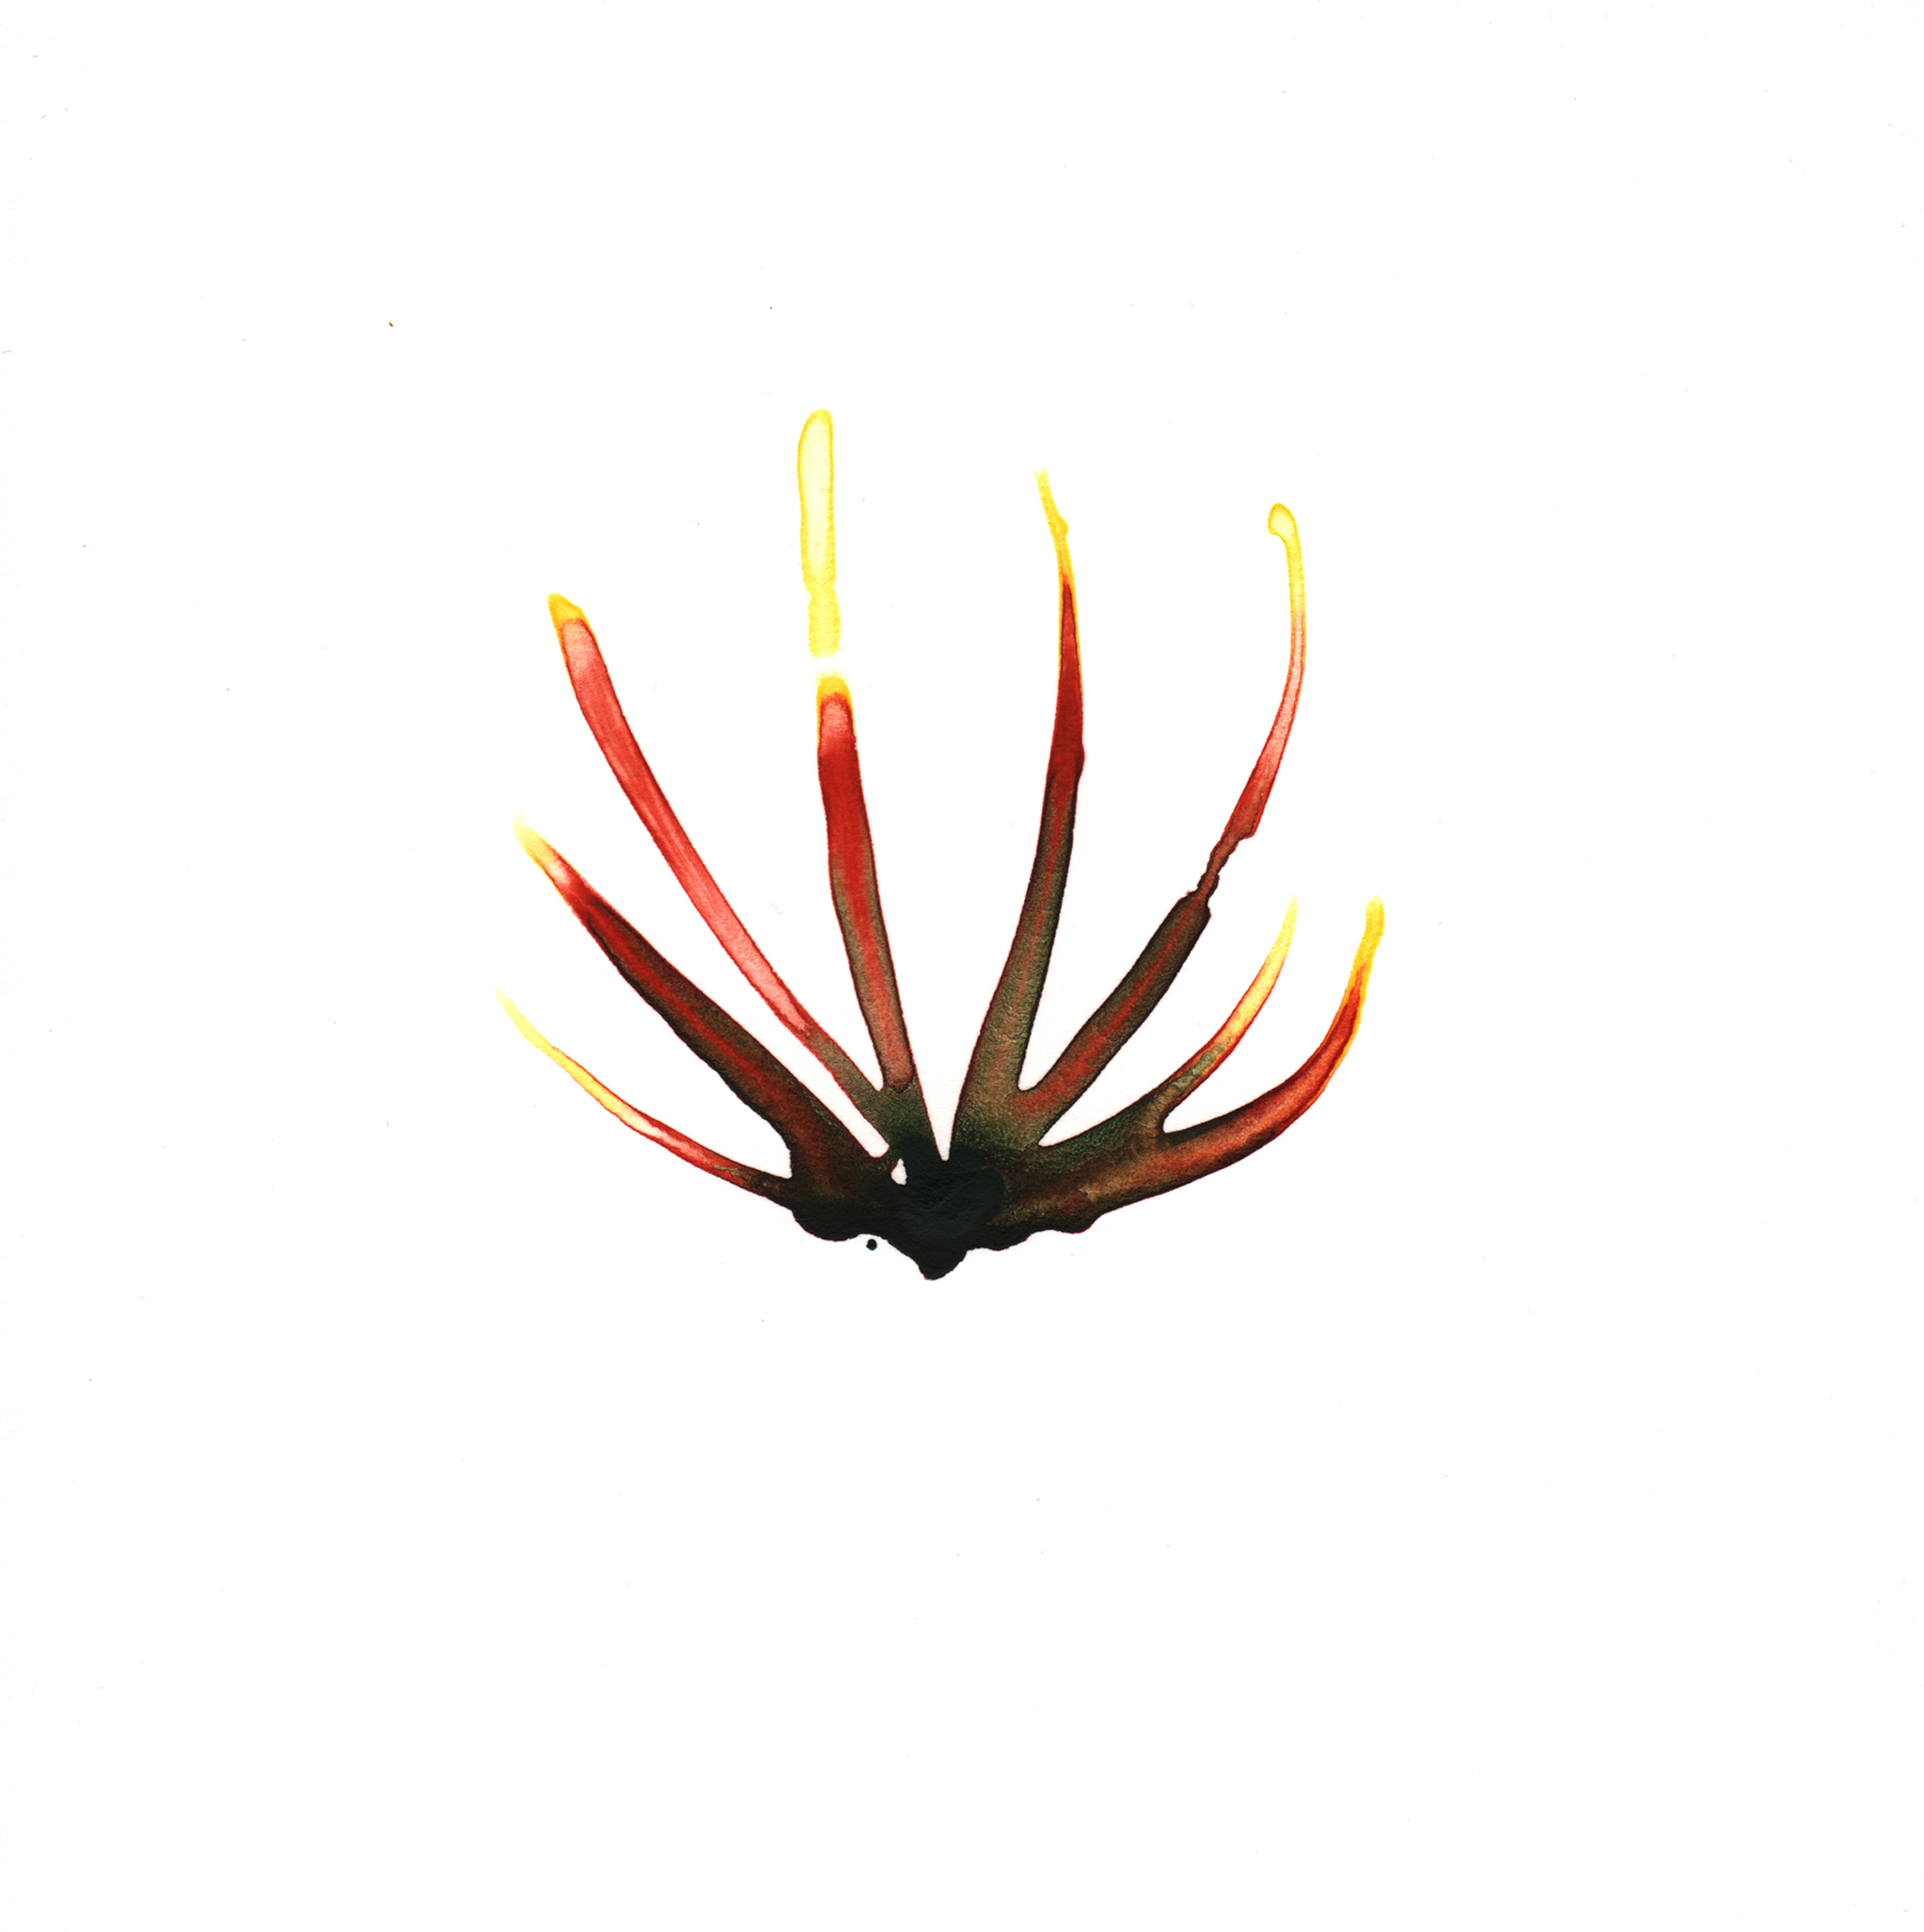 326.Palm.Frond.12.31.14.jpg